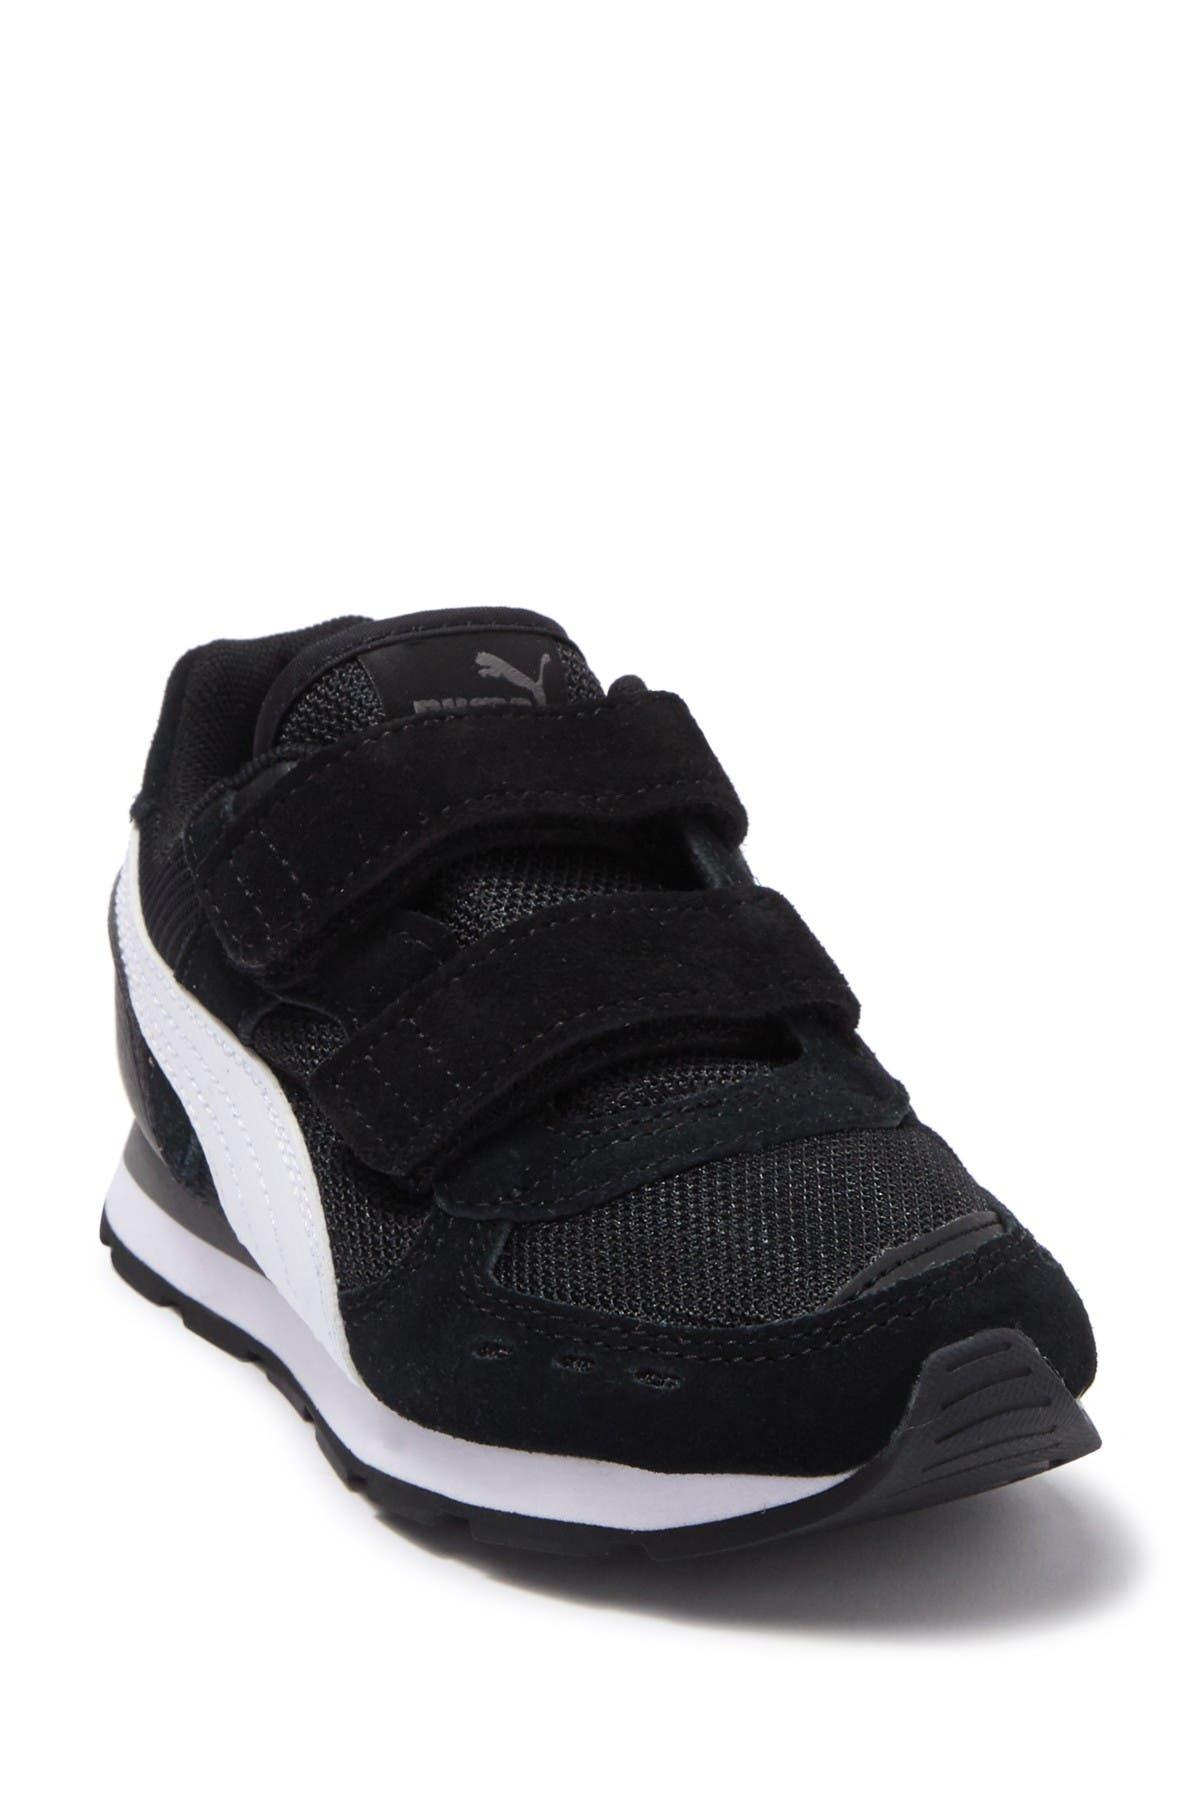 Image of PUMA Vista V PS Sneaker